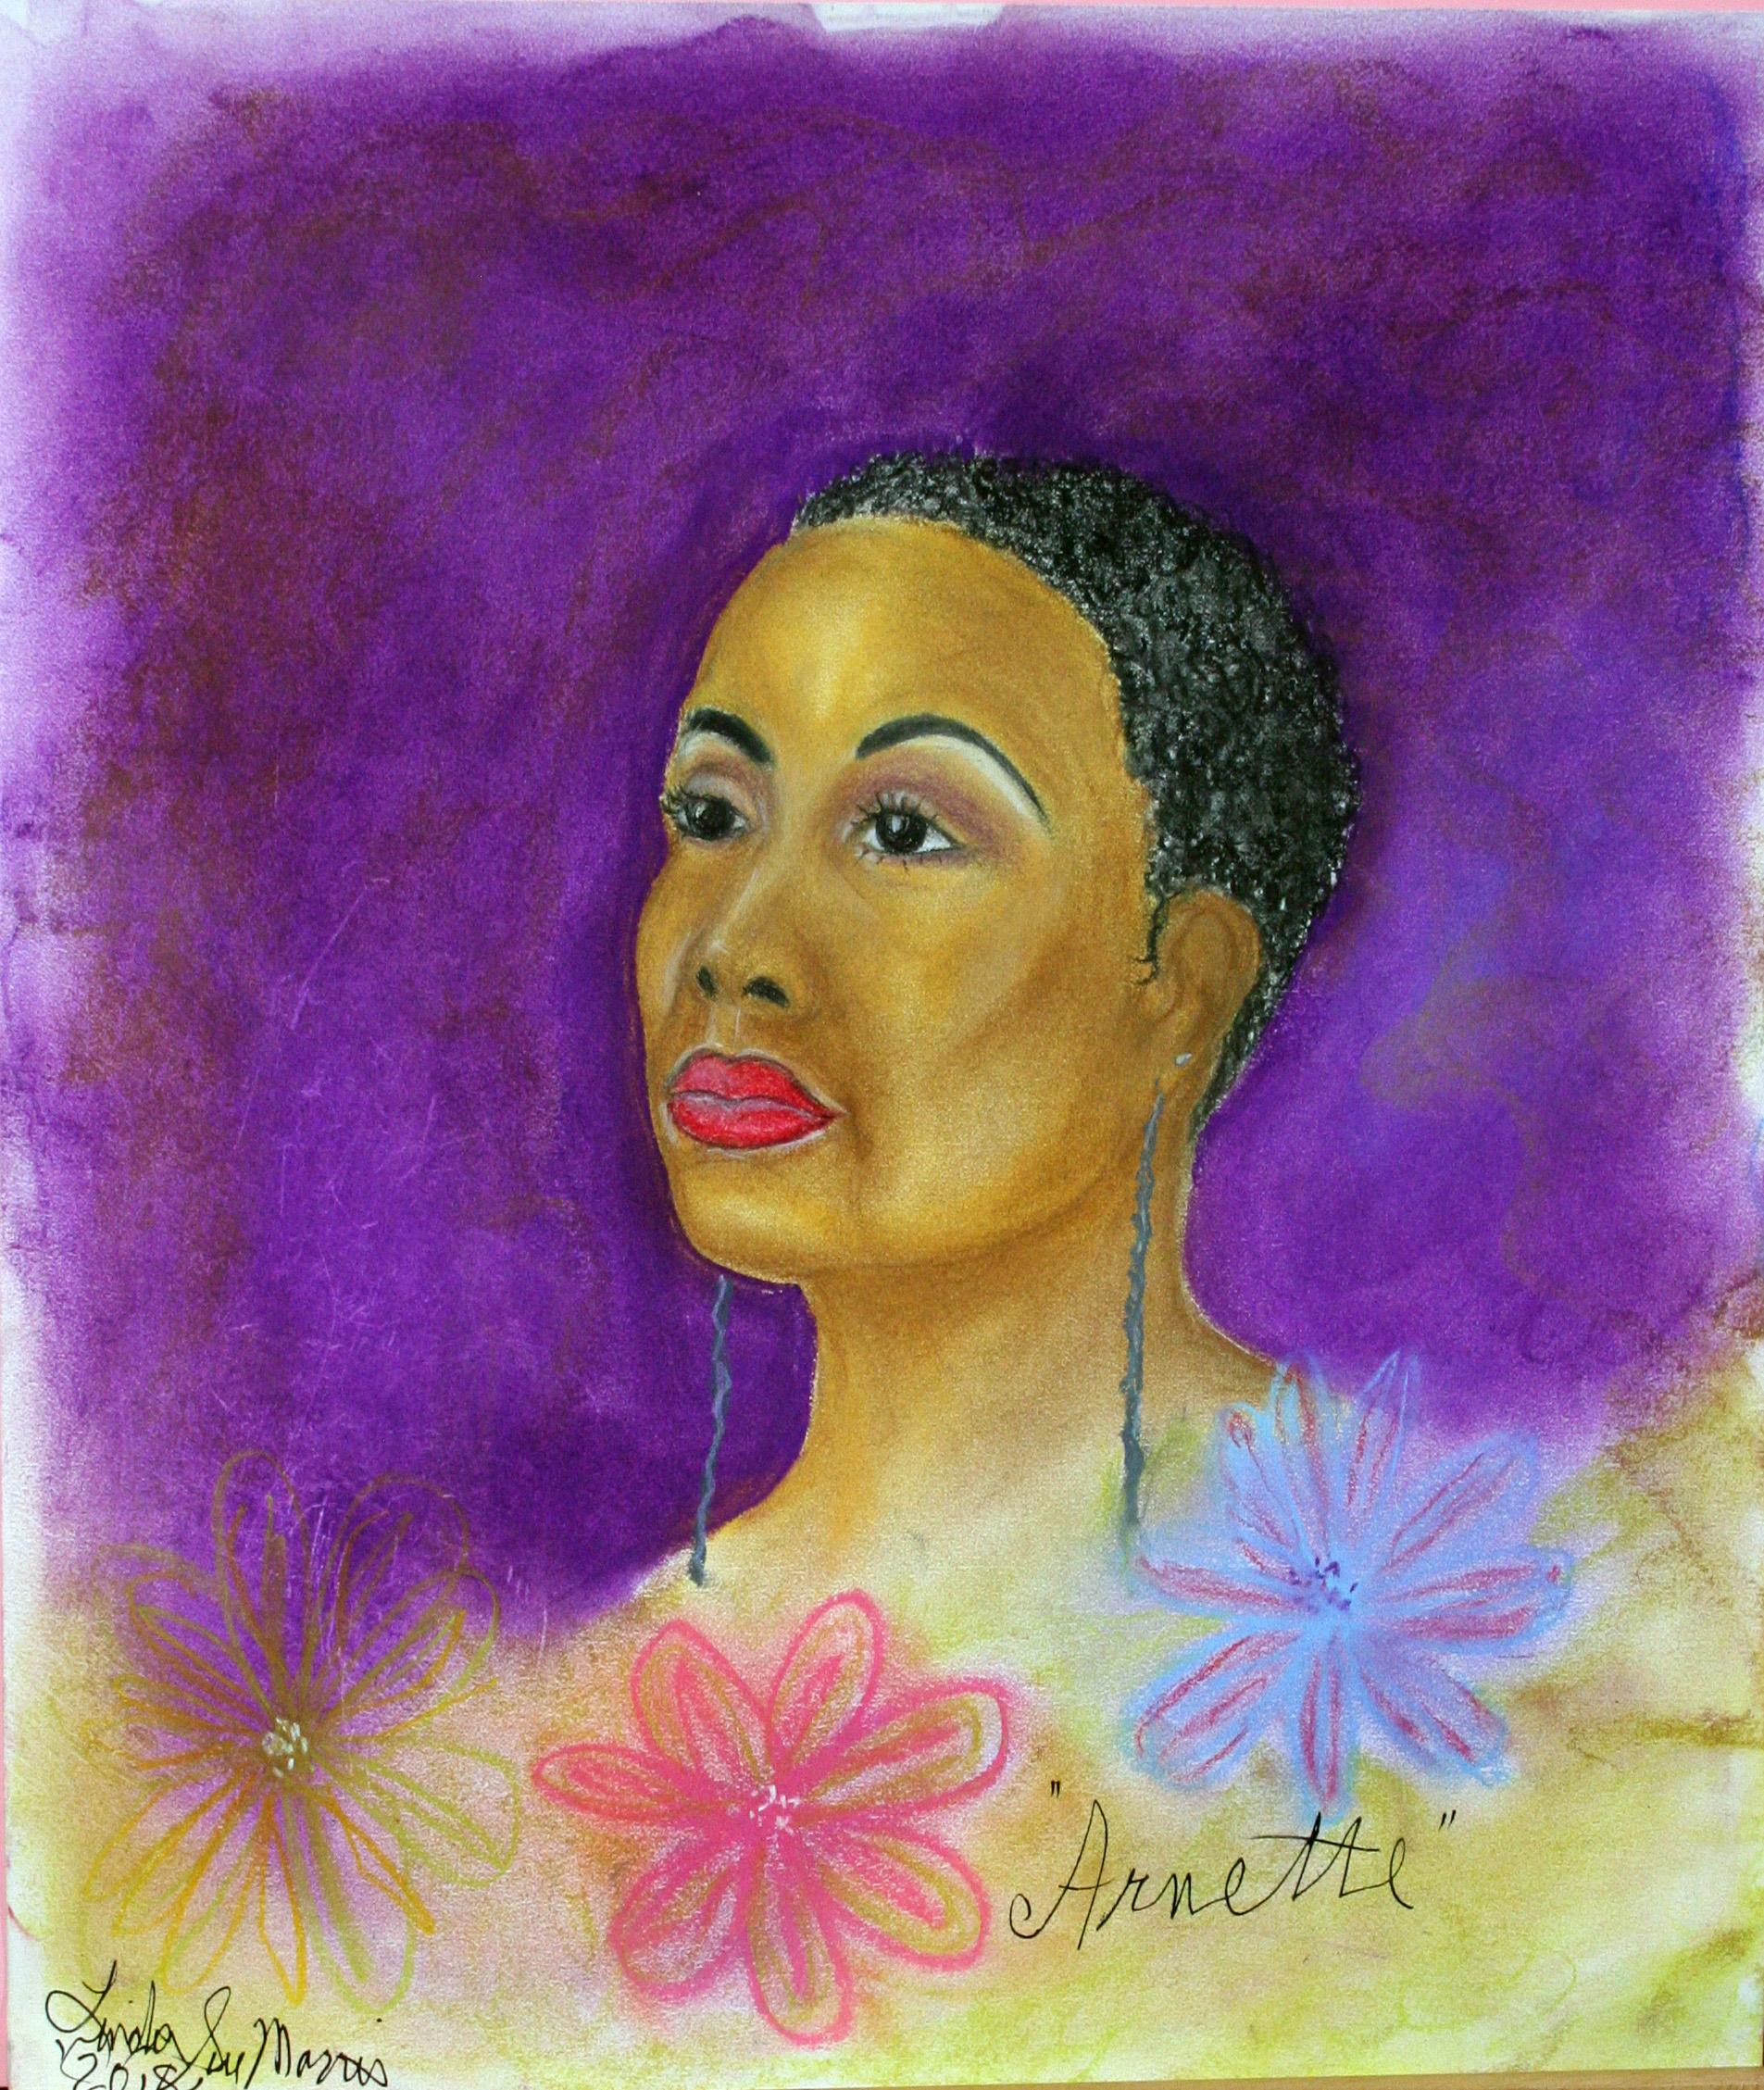 Linda Sue Morris did this pastel drawing.